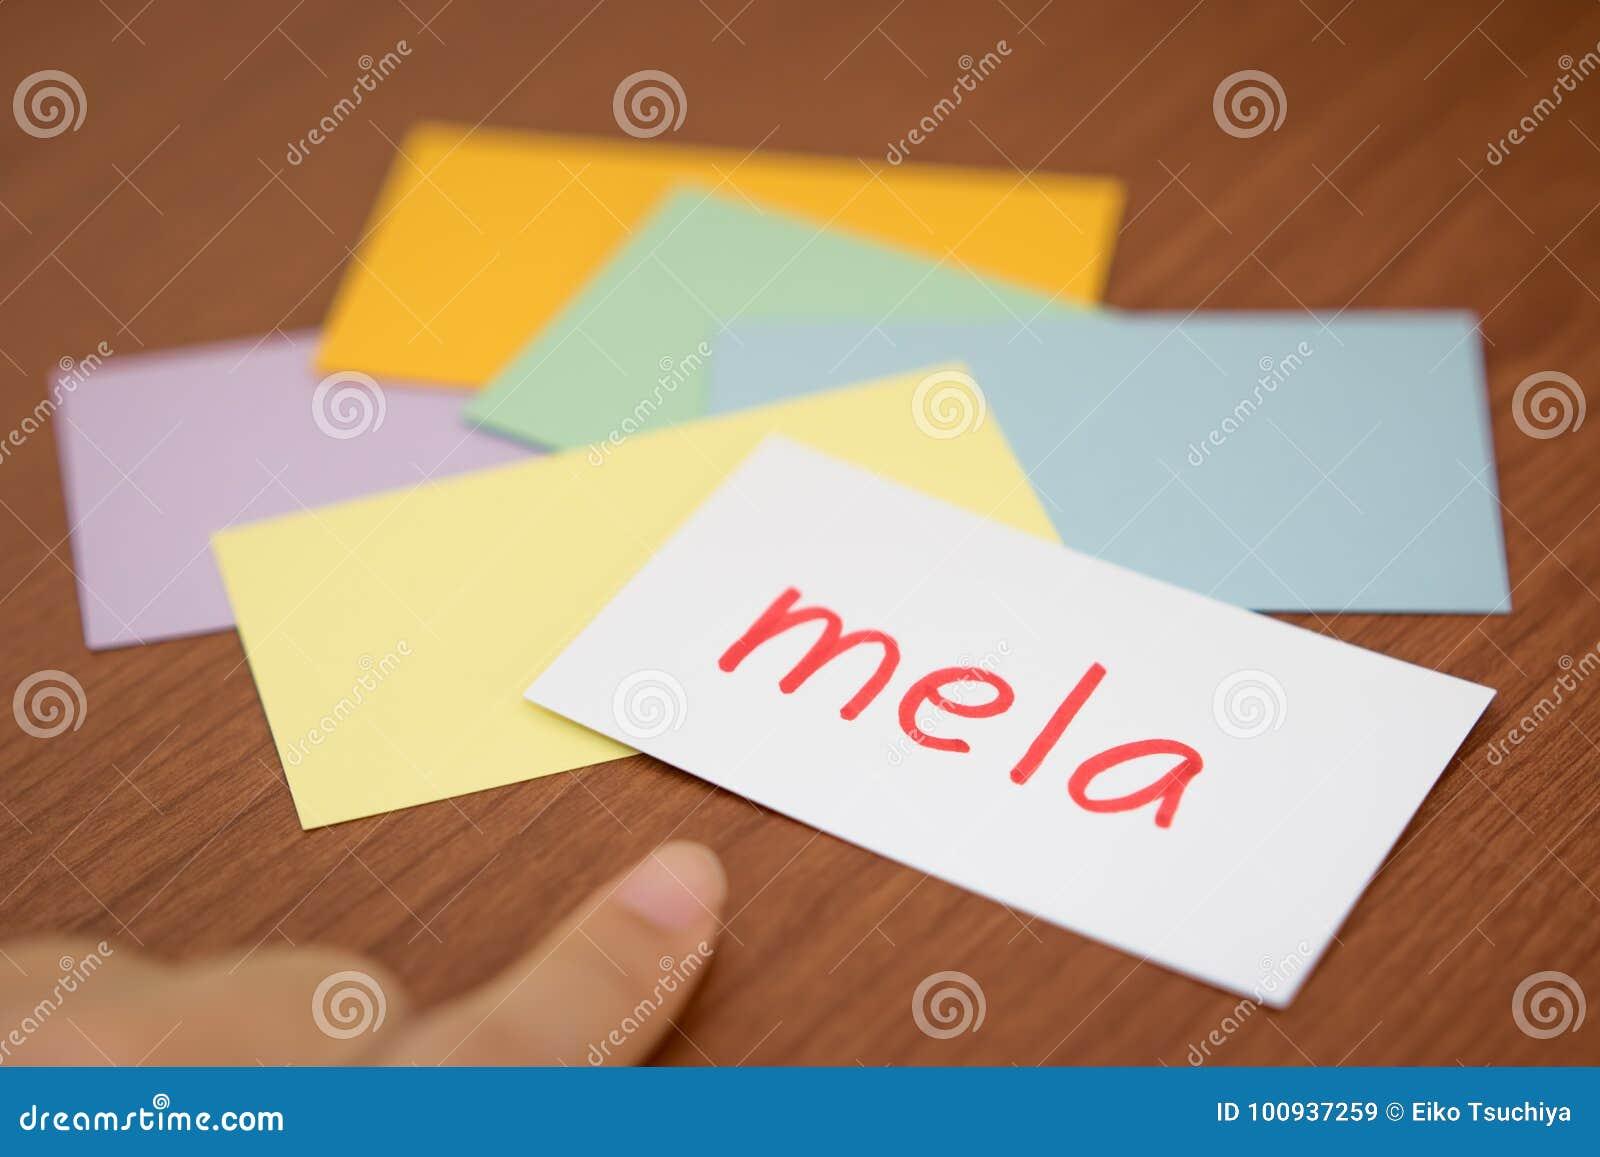 Italian Language Translation To English: Italian; Learning New Language With The Flaish Card